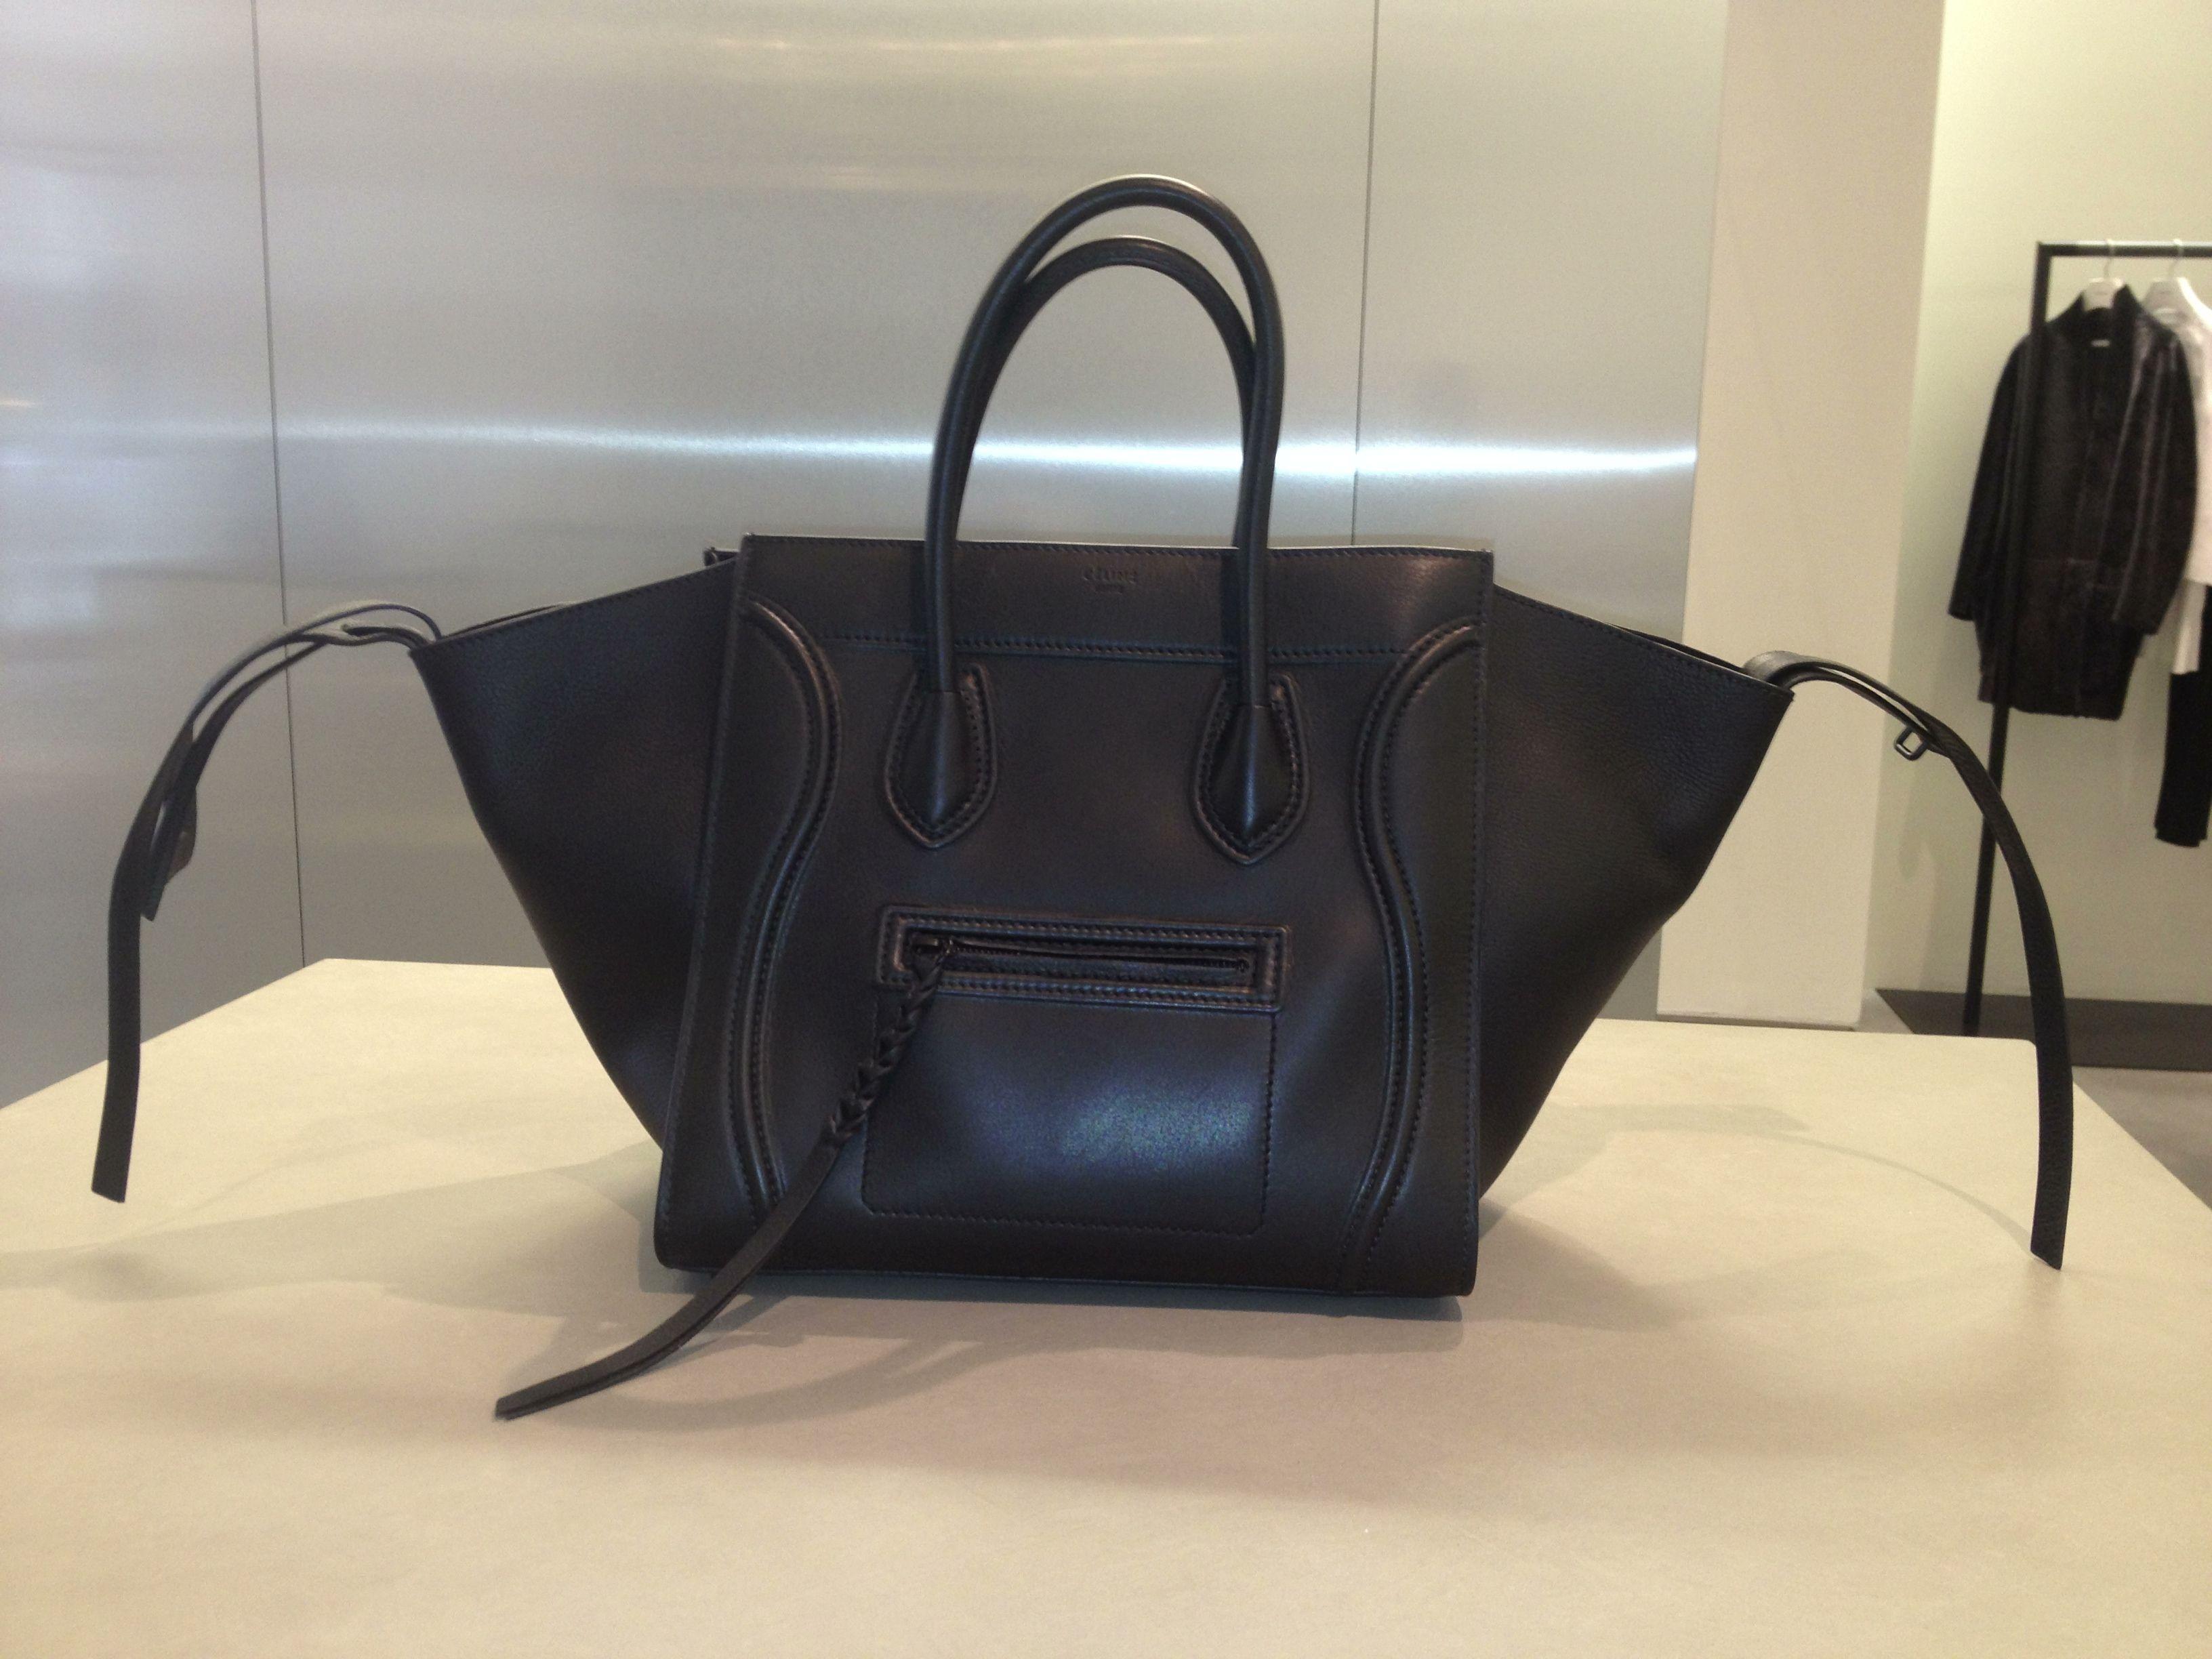 c5f8d62384 Celine Phantom bag